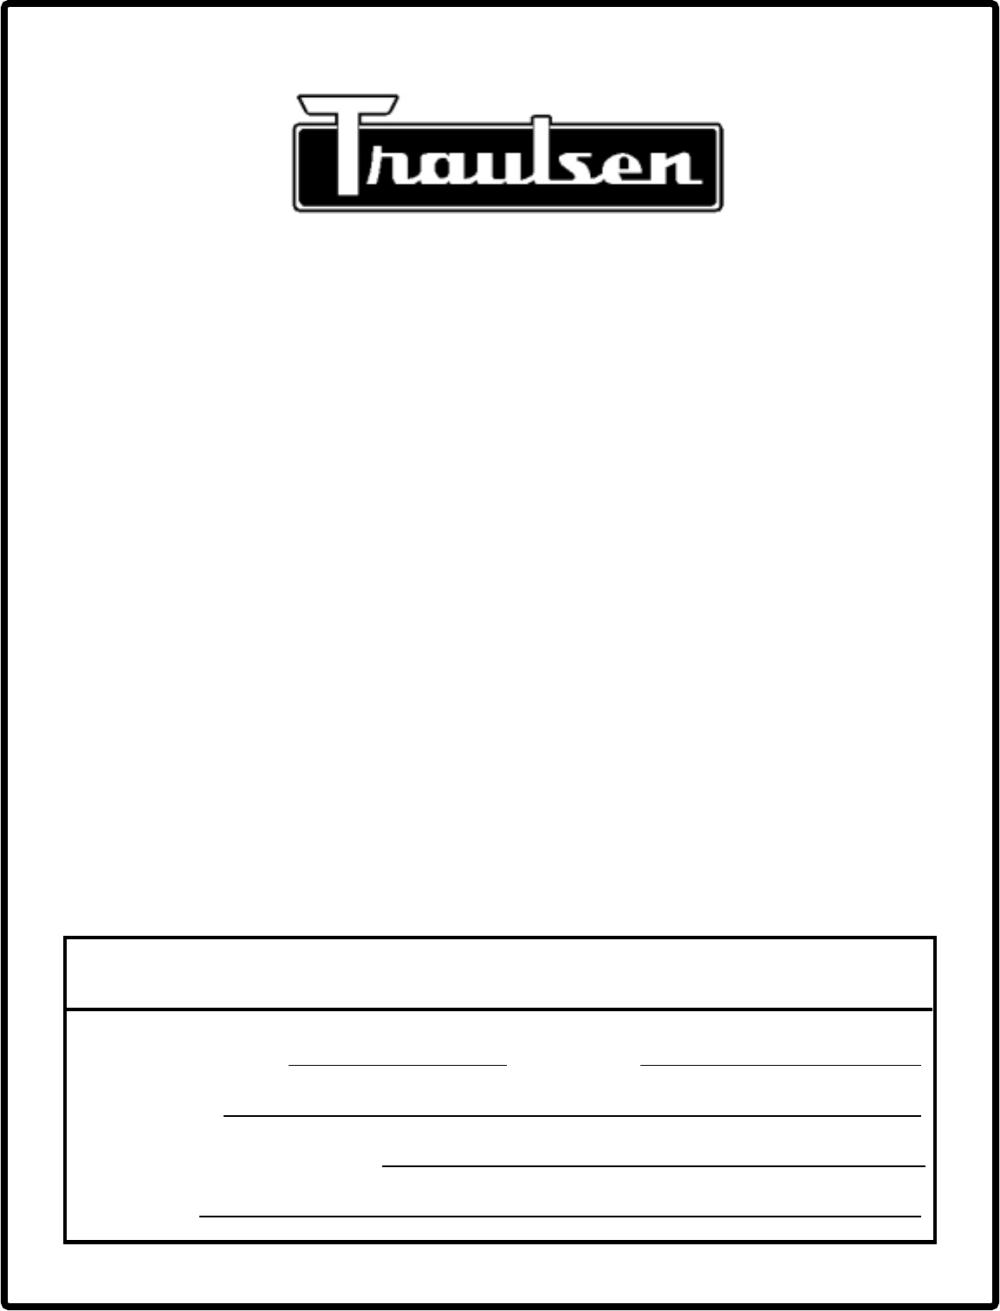 medium resolution of traulsen vps66s vps manual user to the 90222544 1d0a 48d6 8faetraulsen vps66s vps manual user to